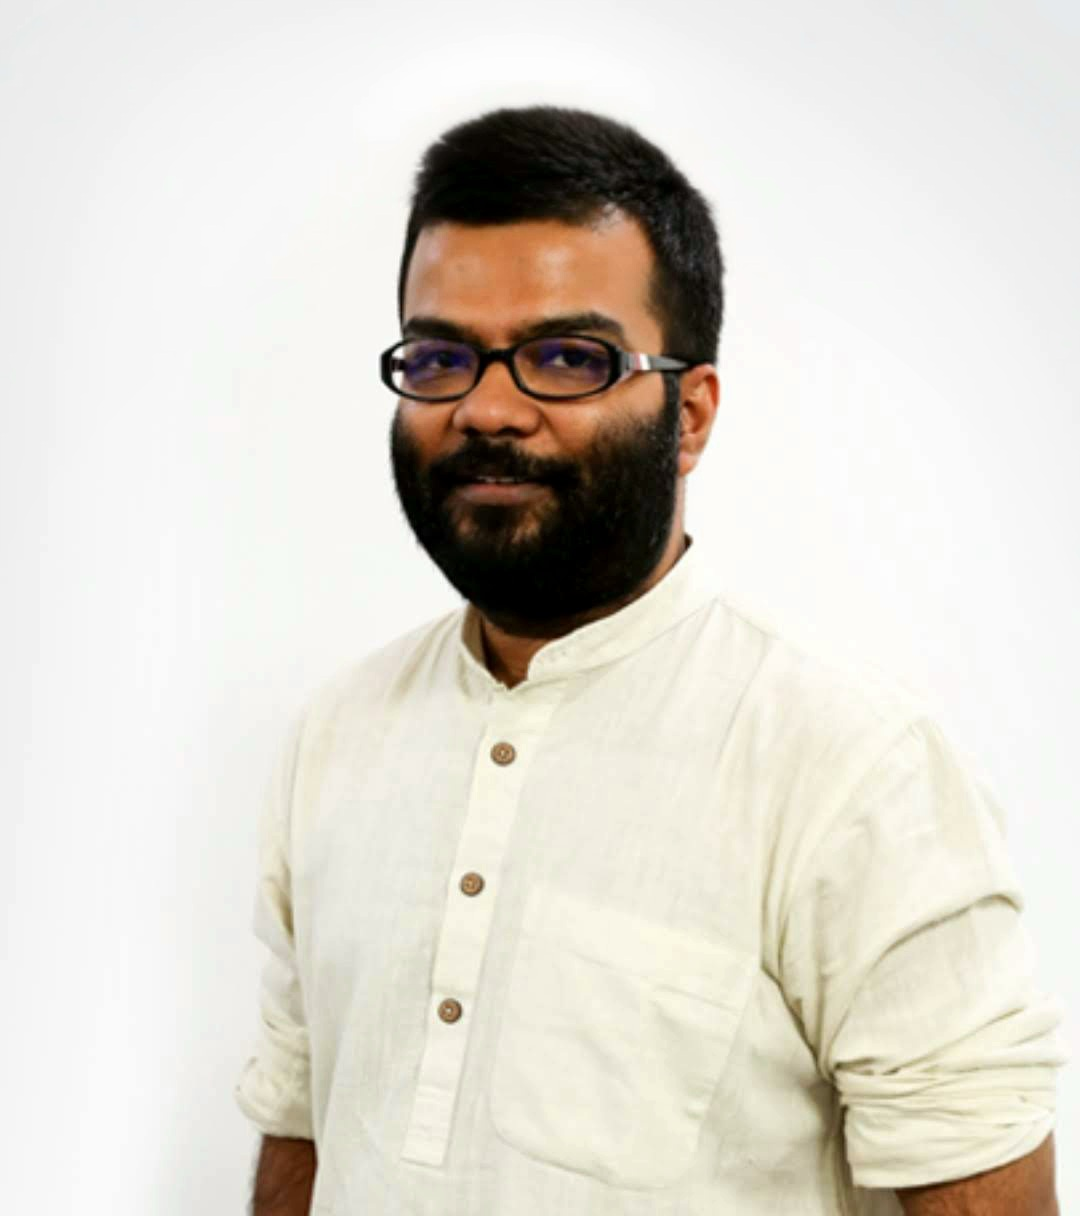 Mr Tanmoy Goswami